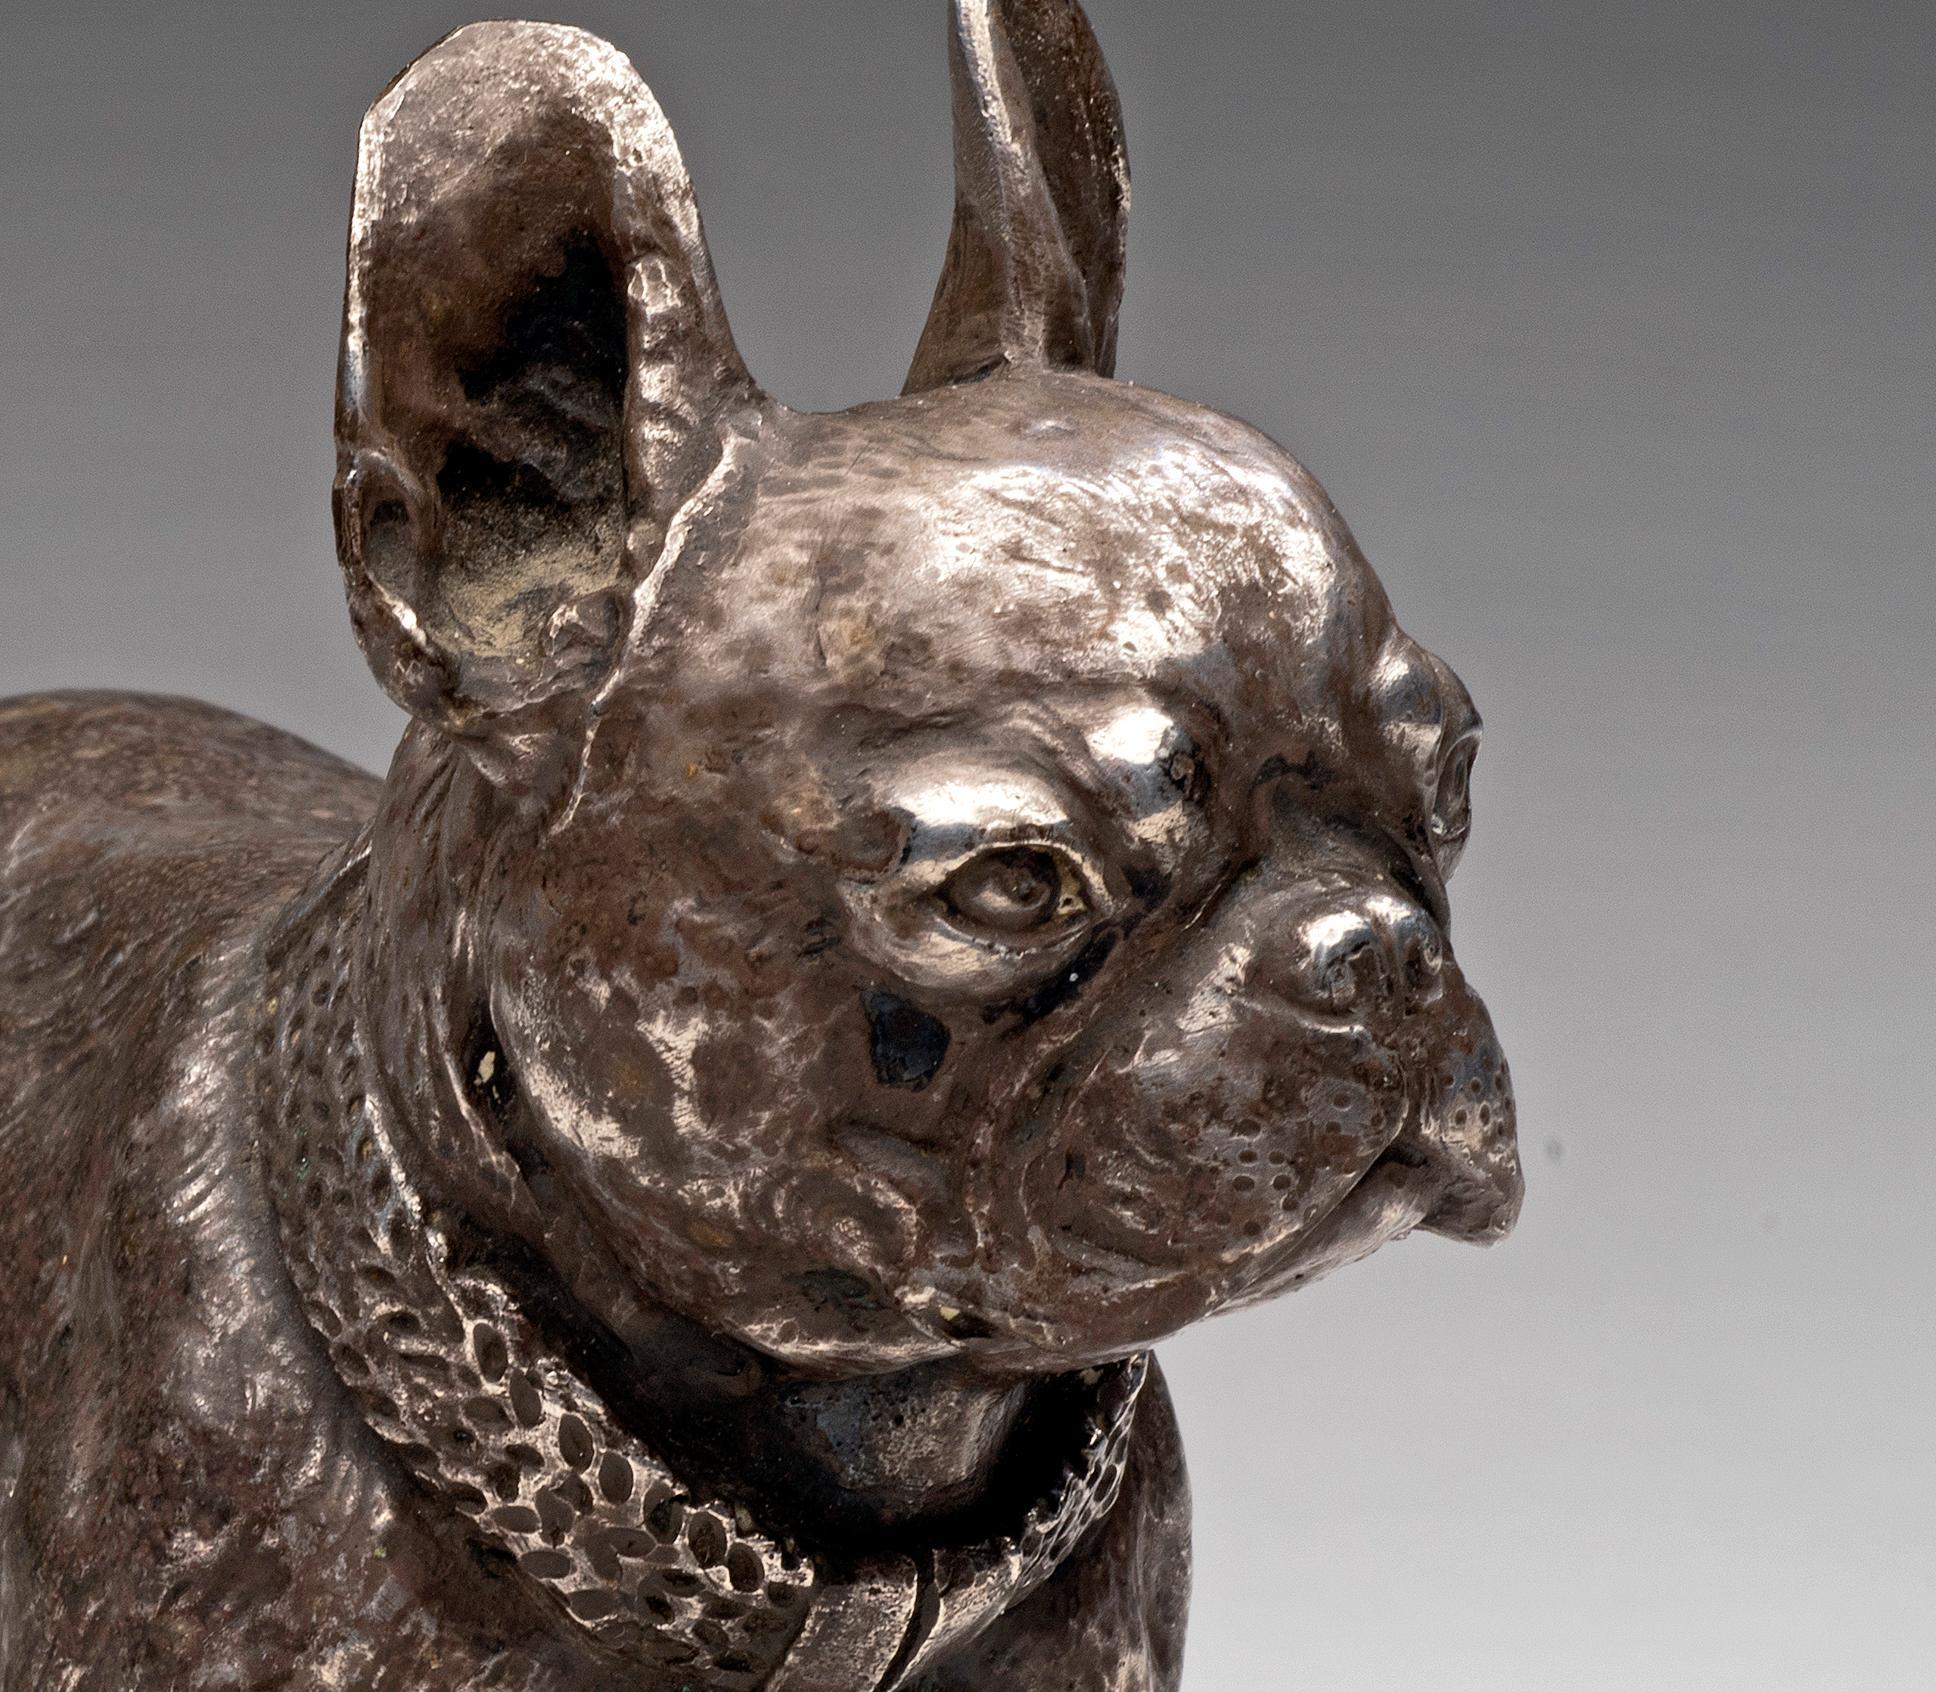 Dog Portrait of a Silvered Bronze French Bulldog circa 1880s-1890s